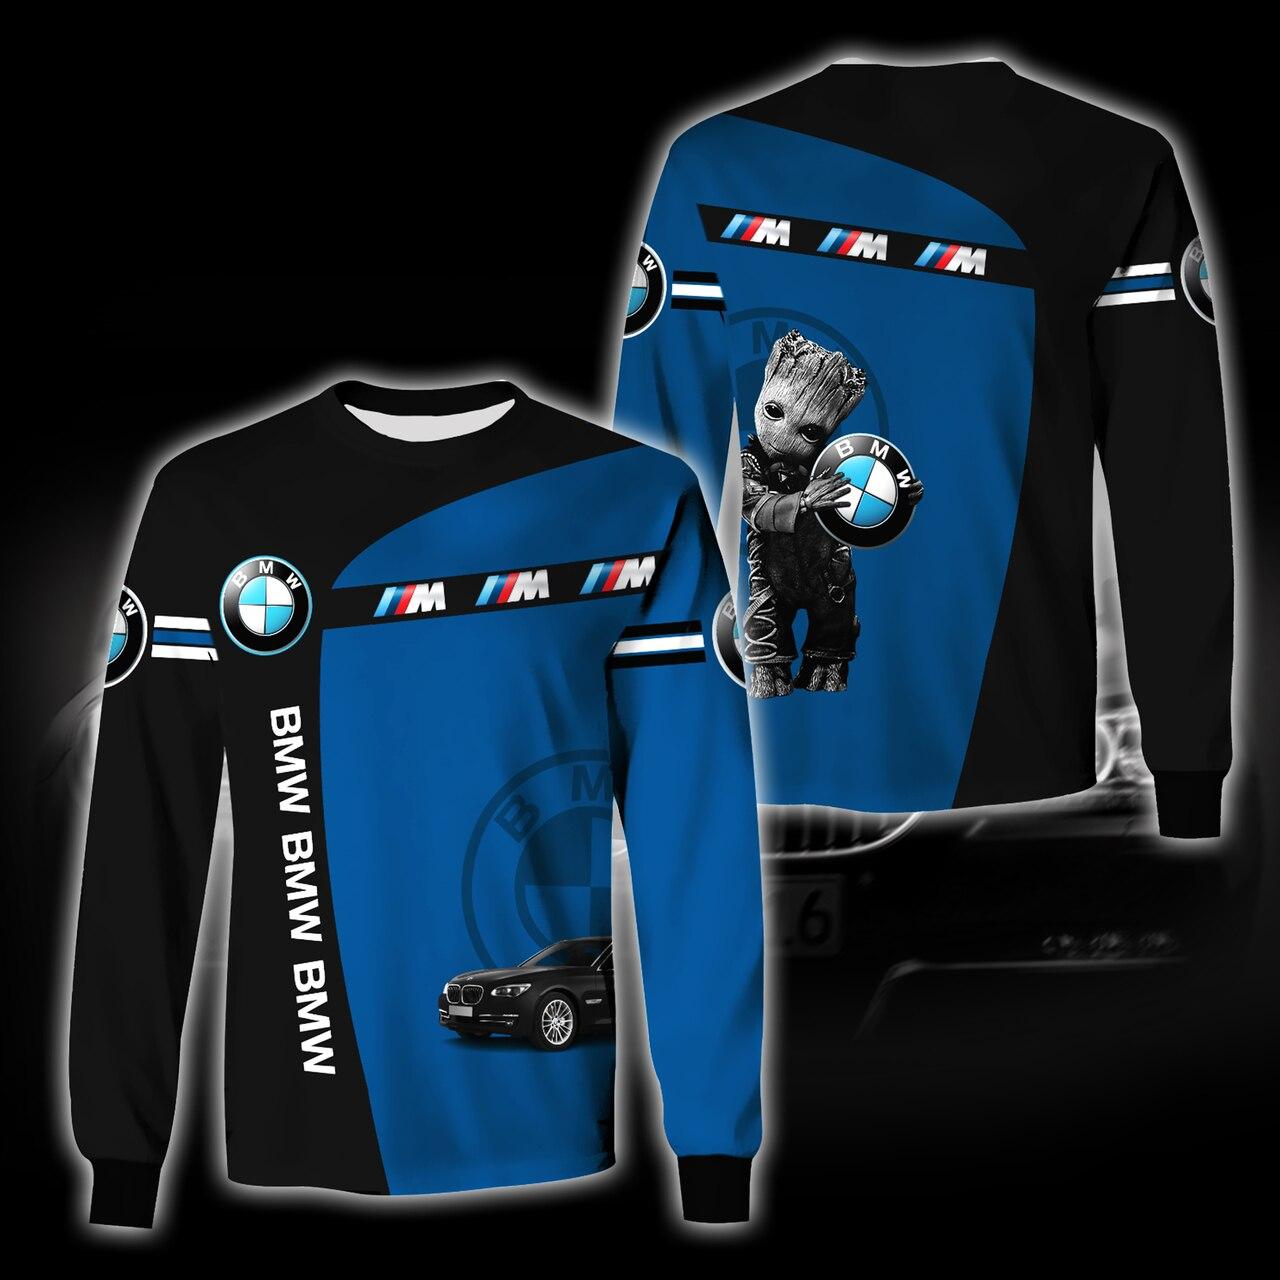 Baby groot hold bmw logo full printing sweatshirt